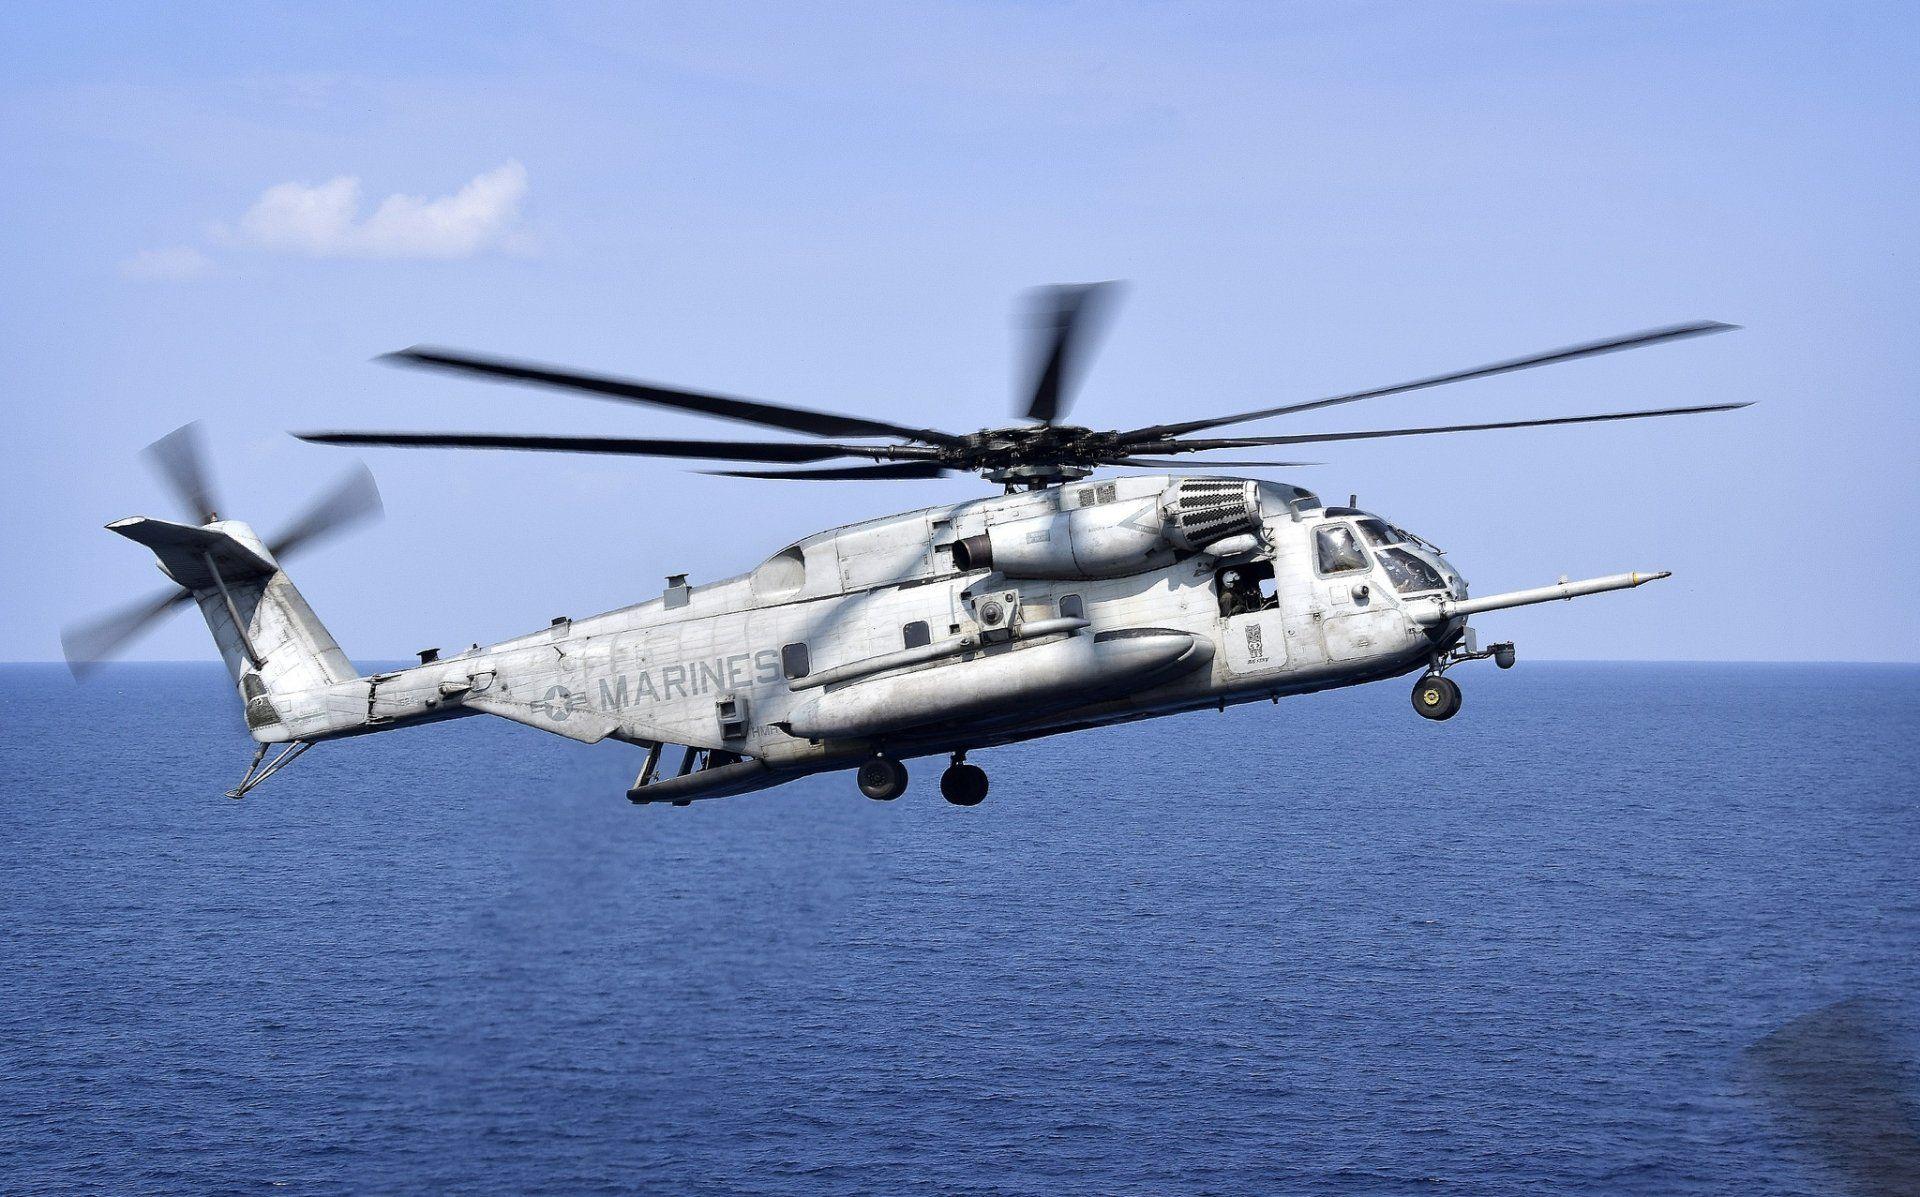 2048x1277 Sikorsky Ch 53 Sea Stallion Imágen De Fondo De